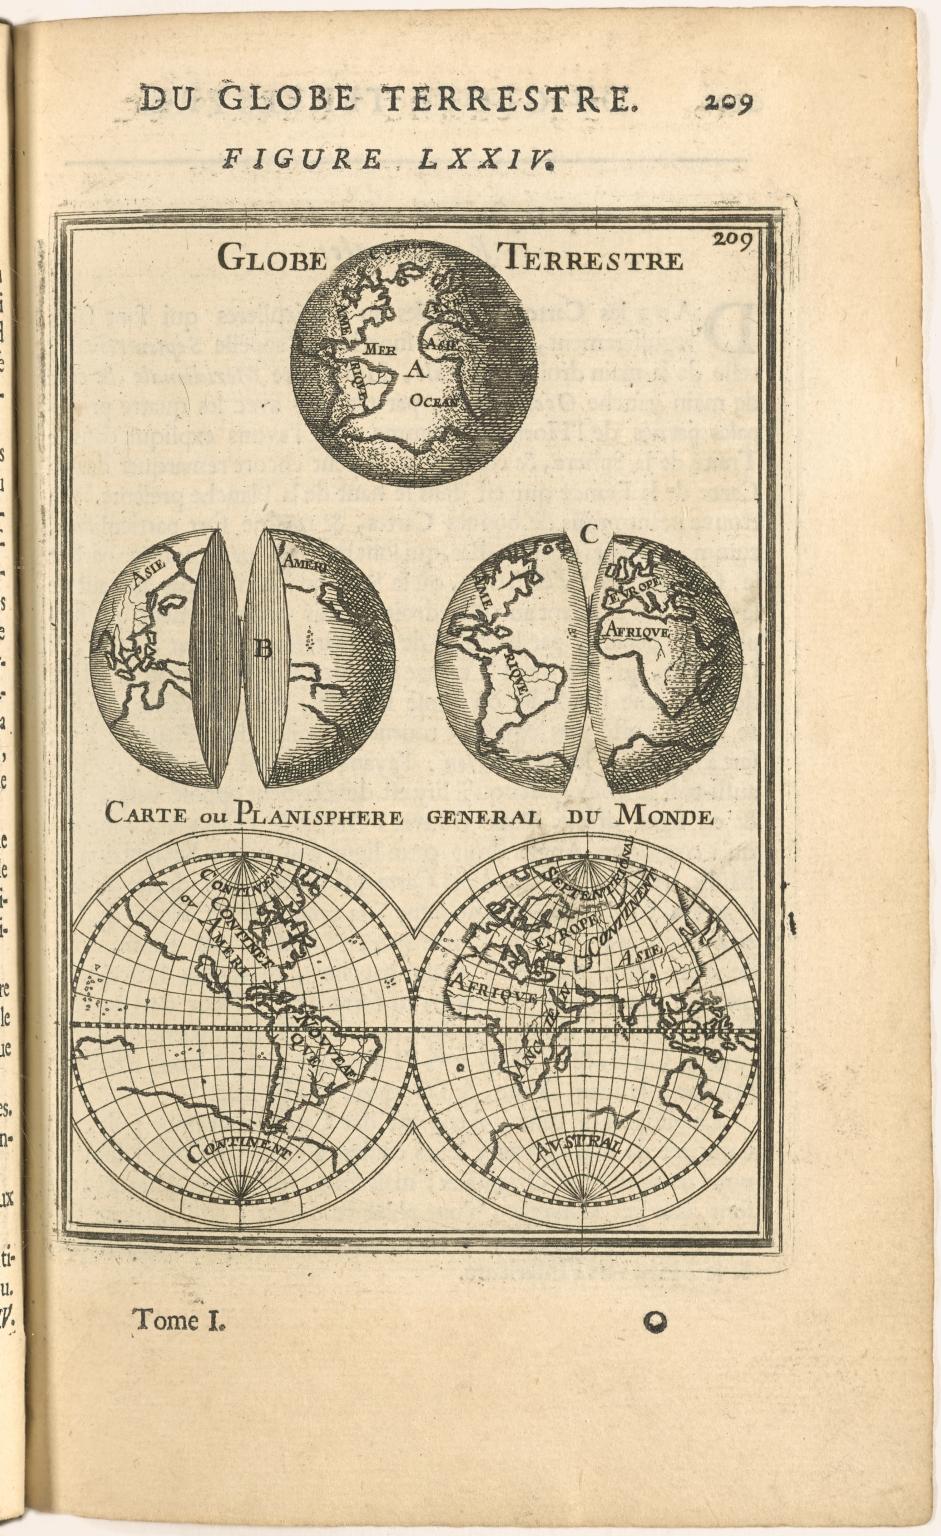 [top] Globe Terrestre [bottom] Carte ou Planisphere general du Monde.